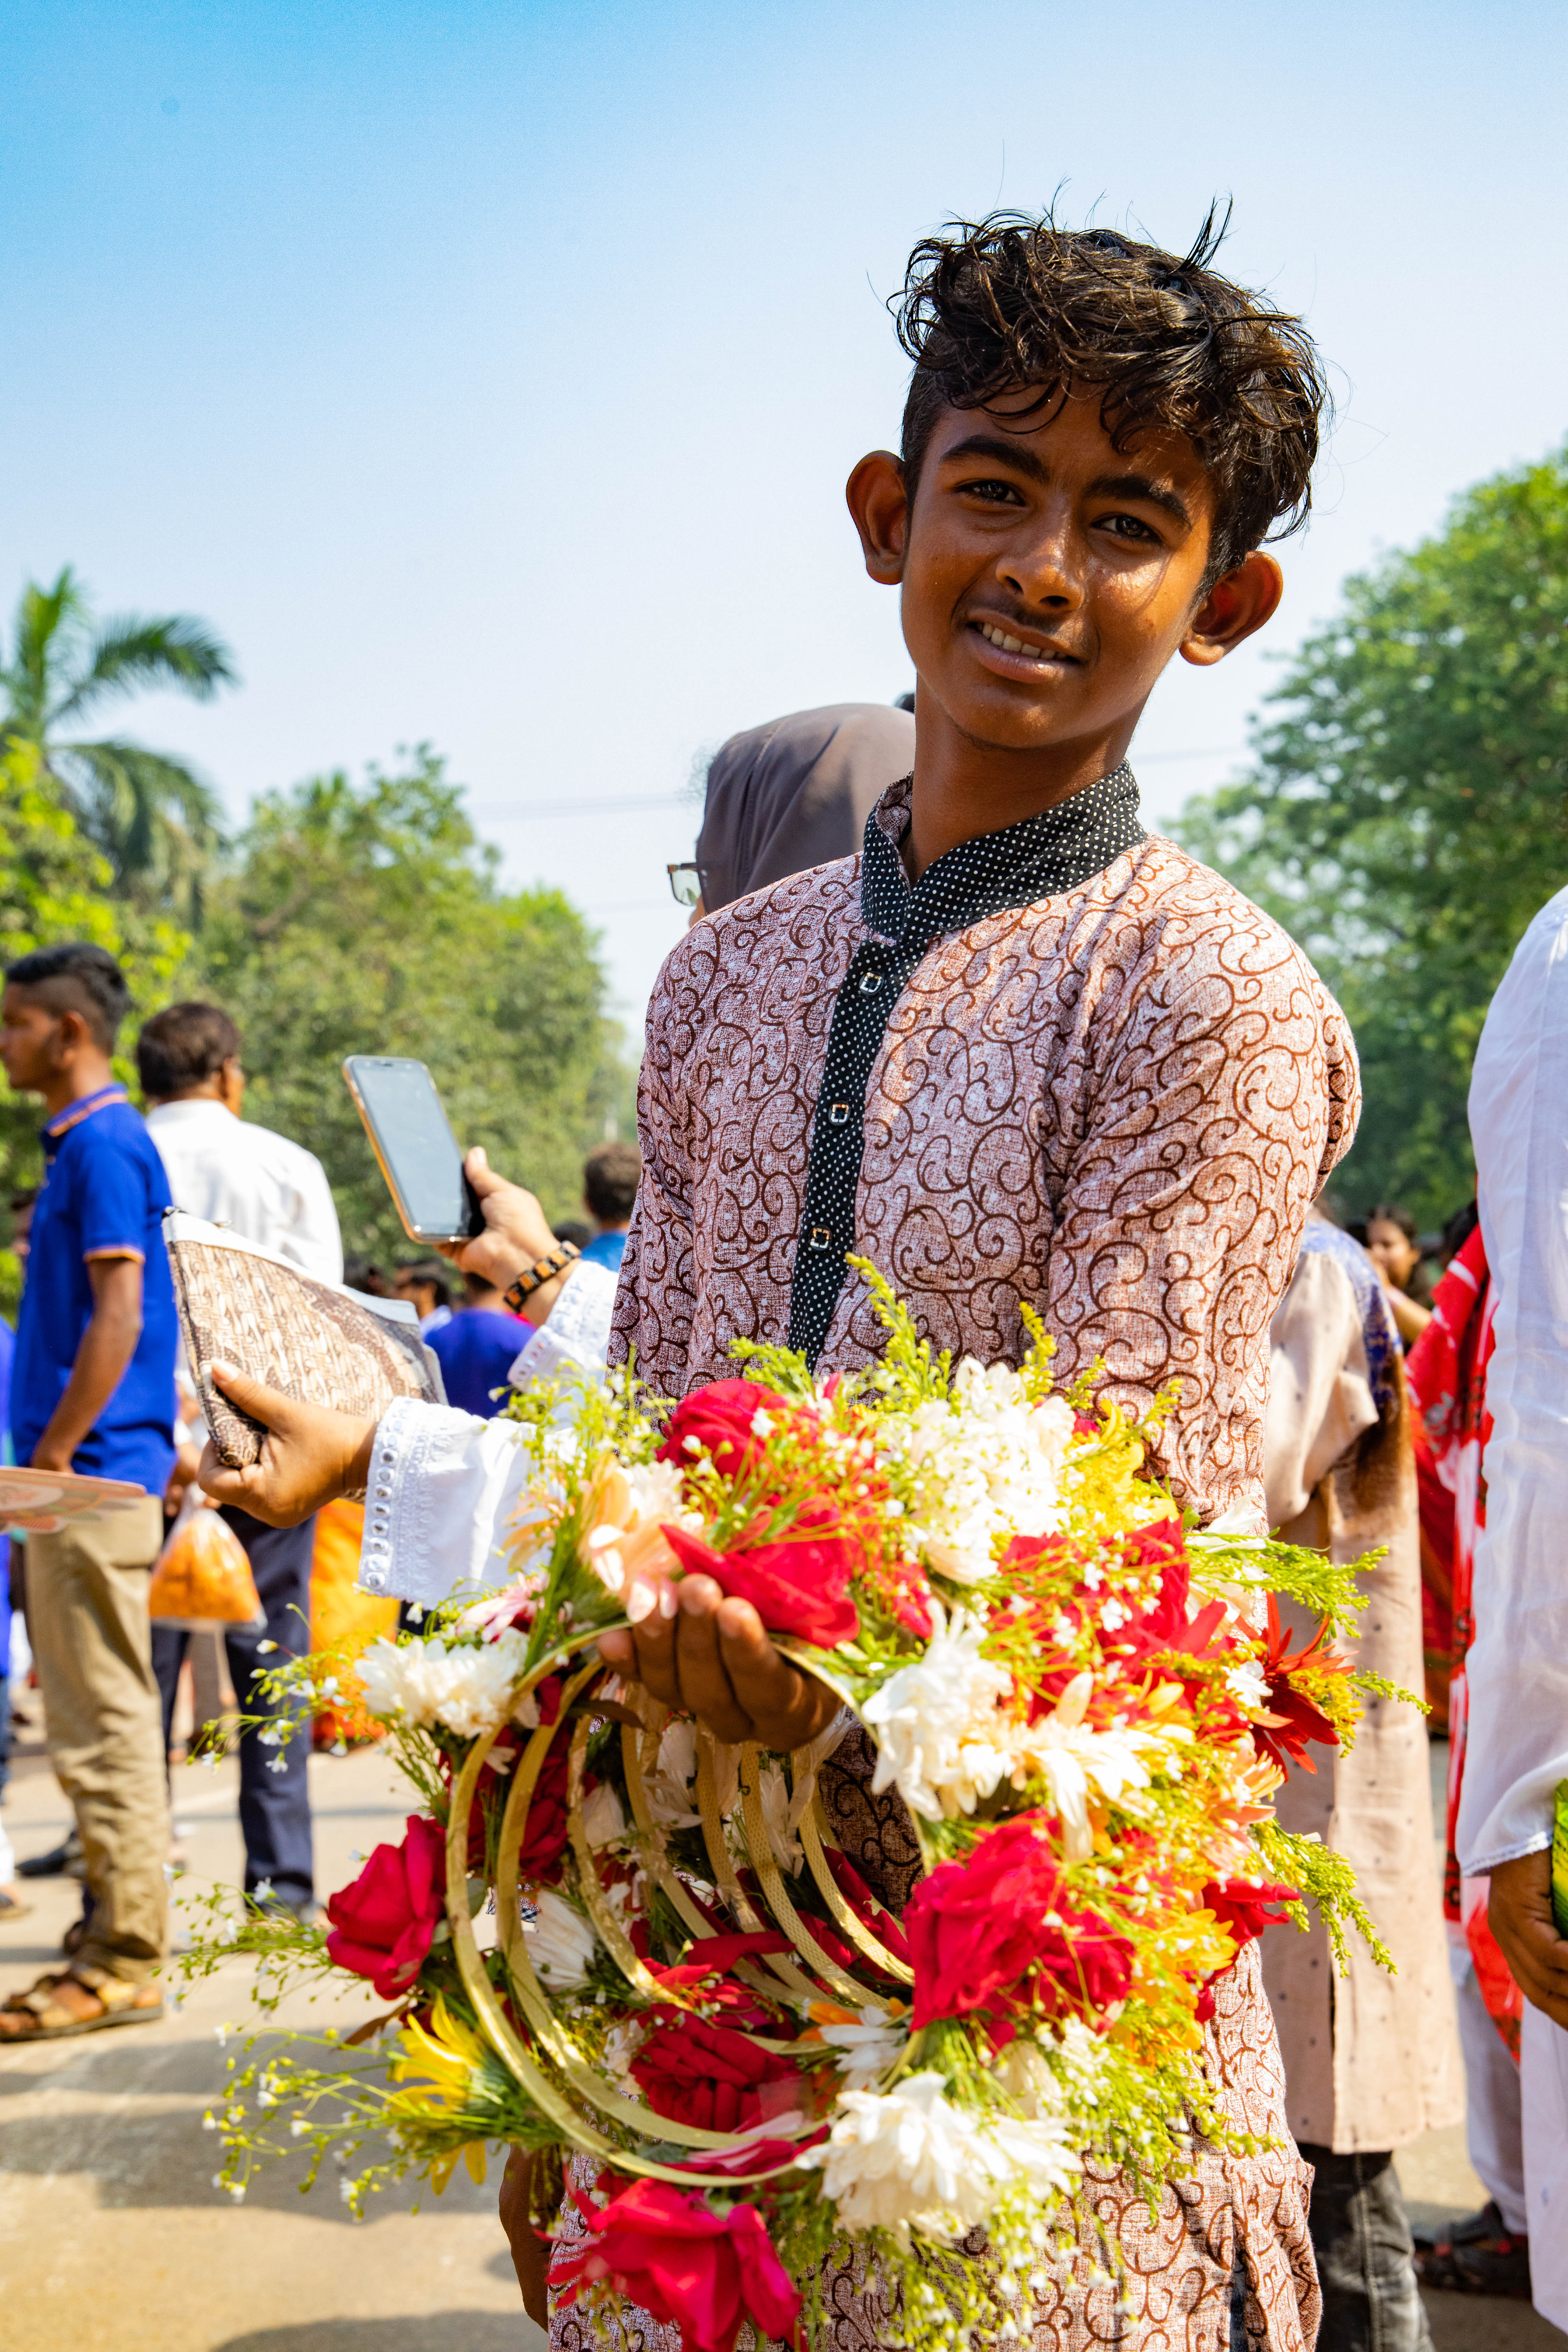 Seller Dhaka Flower Crowns - Bengali New Year - Shuvo Noboborsho